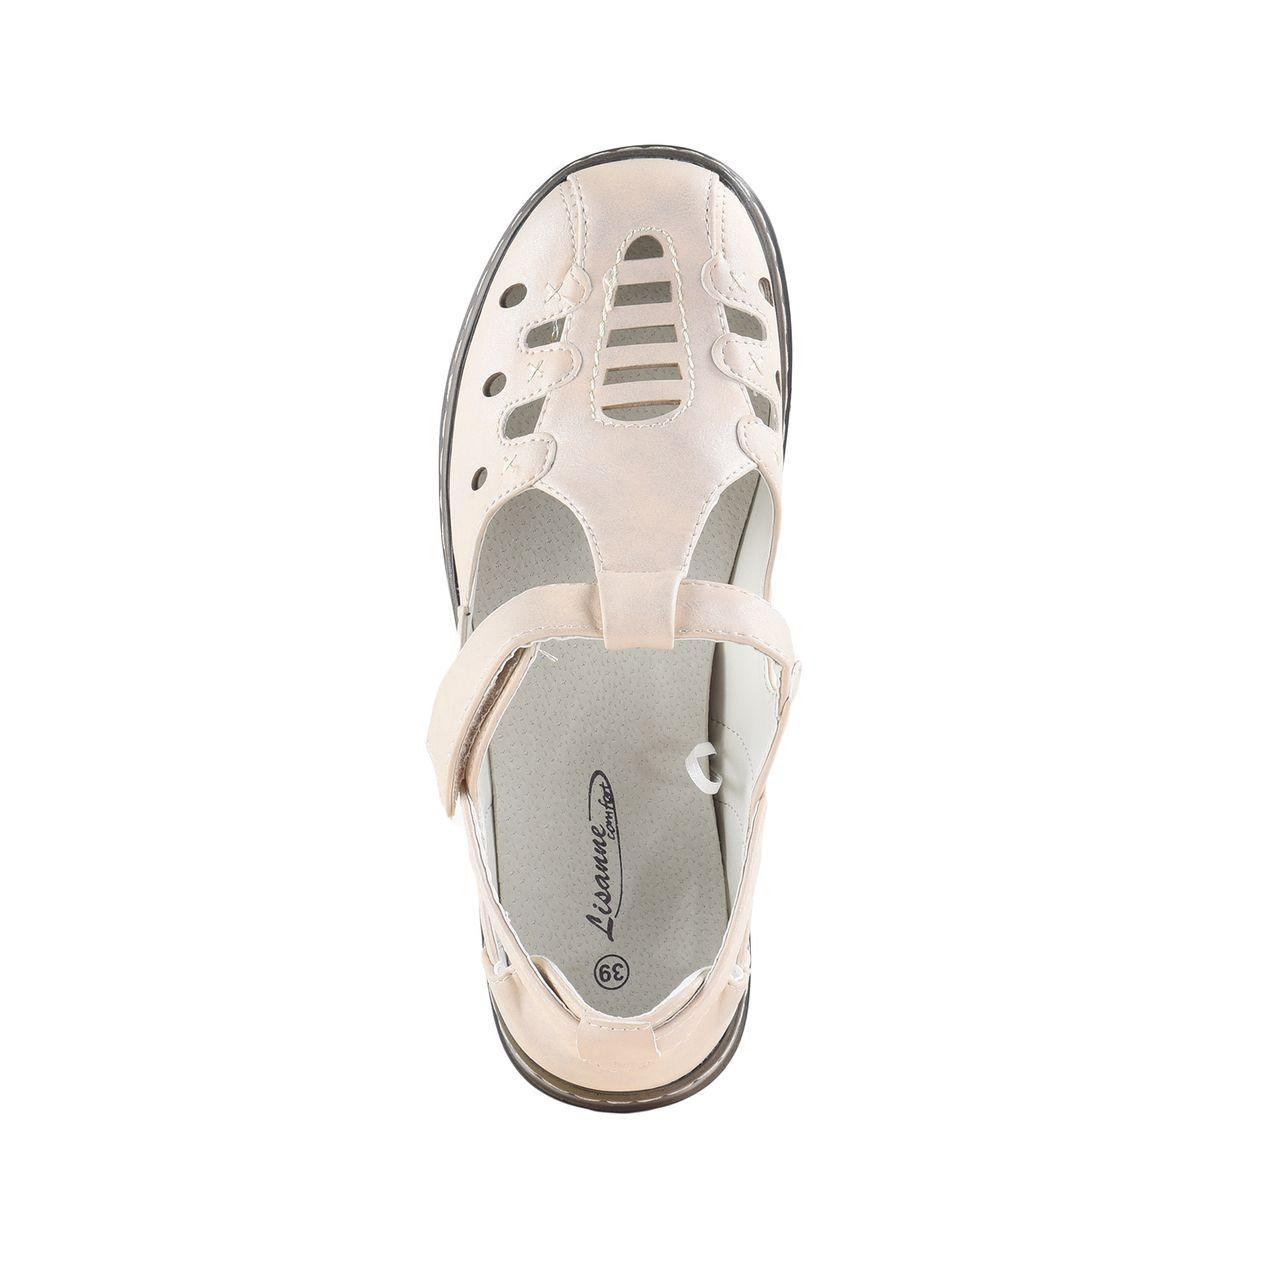 Lisanne Comfort Damen Sandalen Weiß